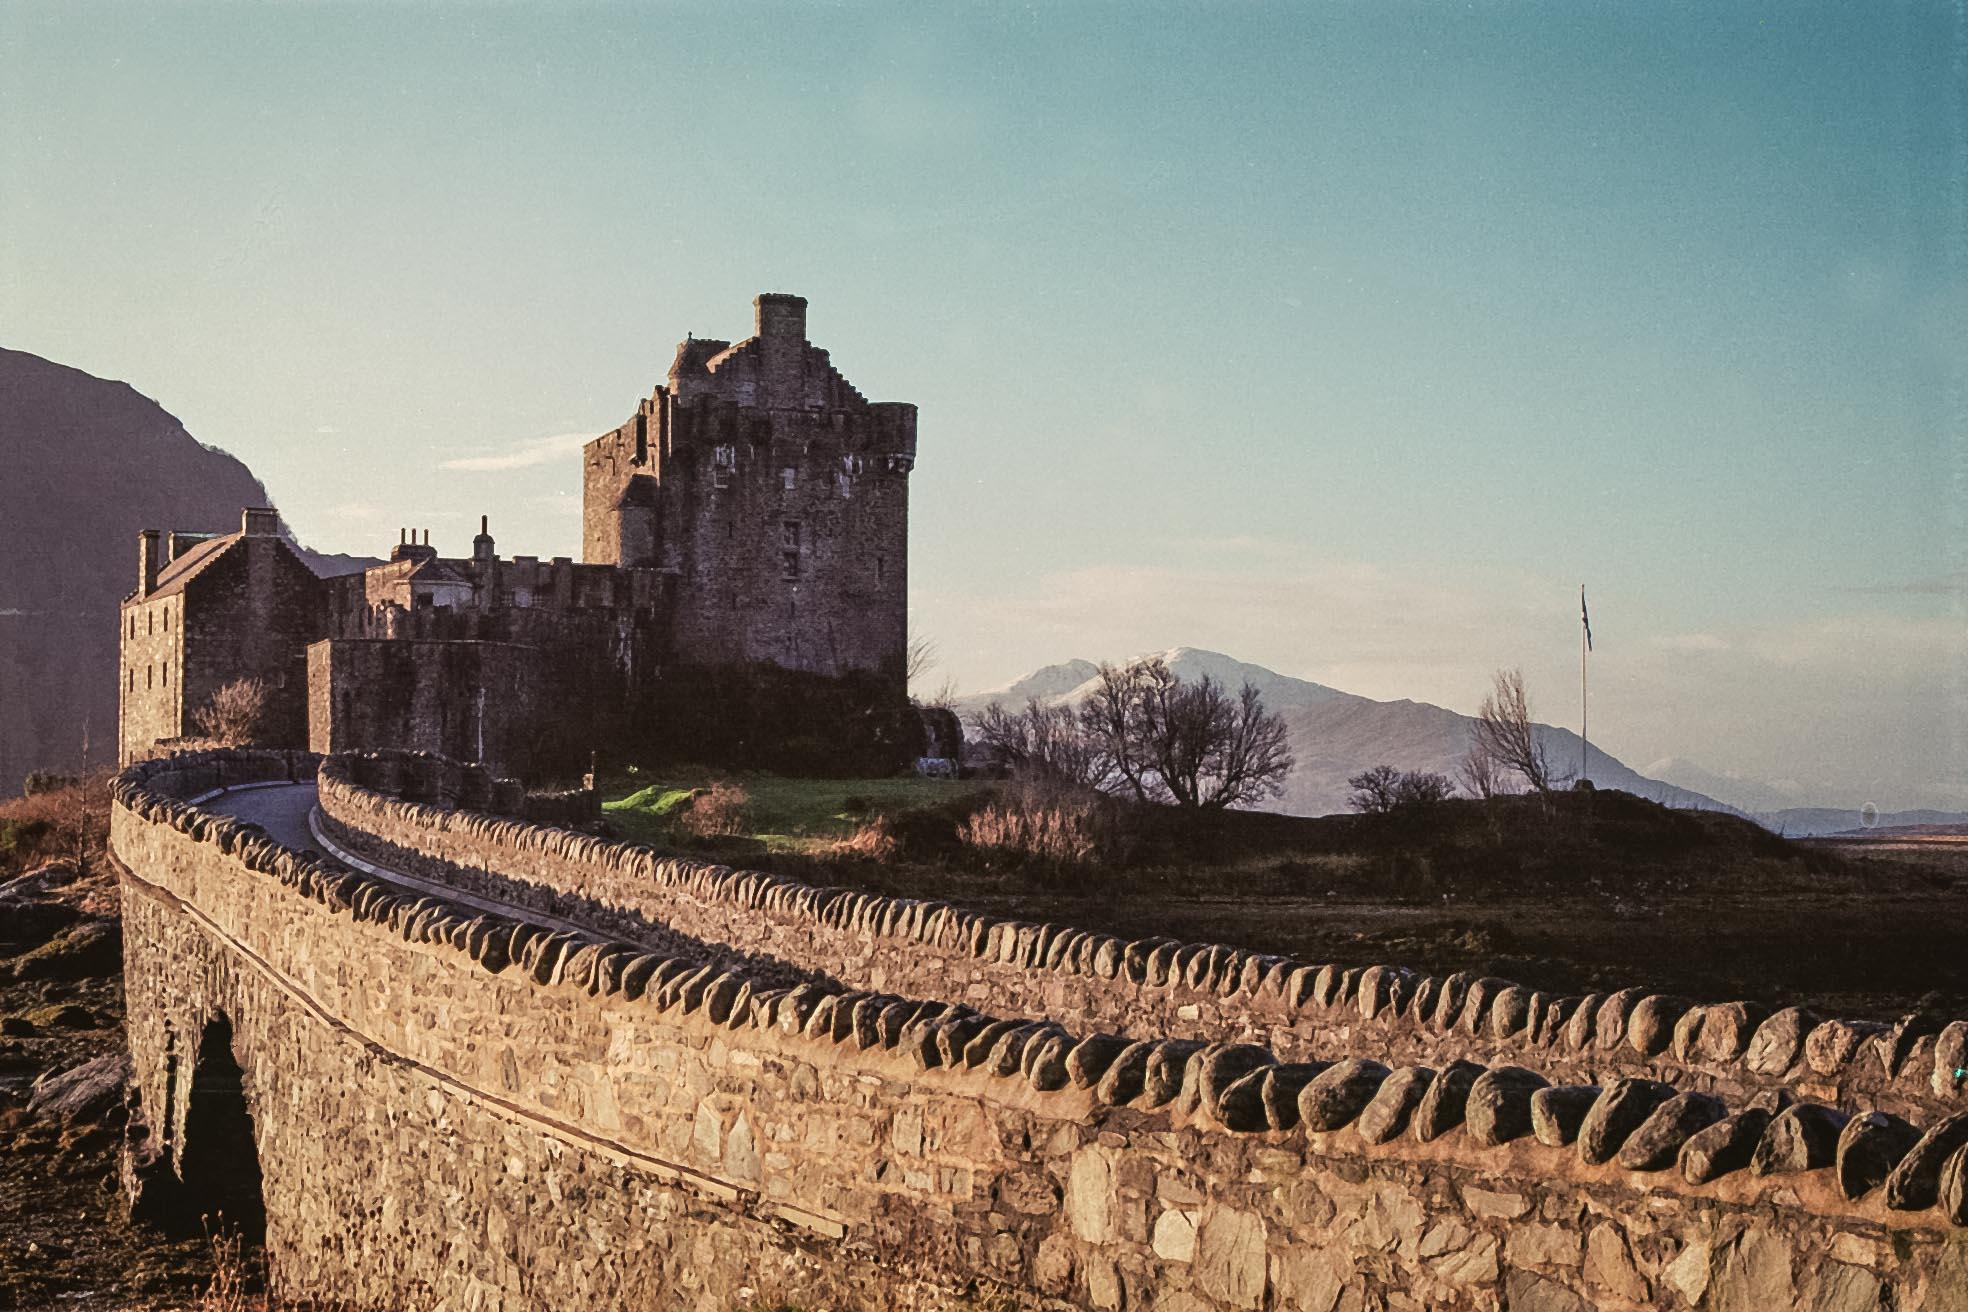 Eilean Donan Castle, about 20 minutes drive away from Skye. Film photo taken by Aaron.